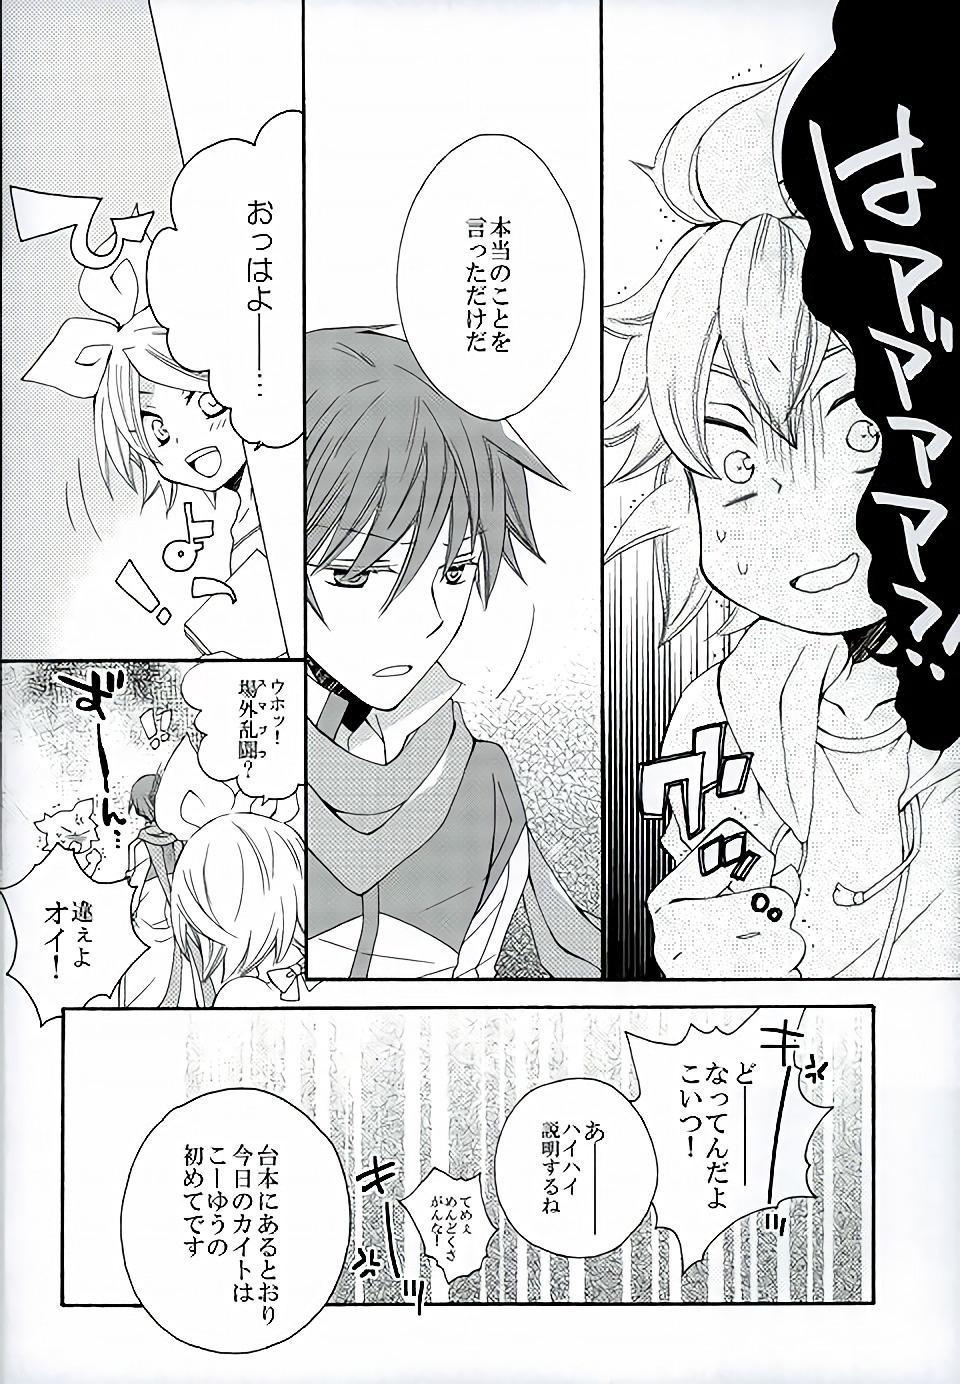 Hatsudori Document 12